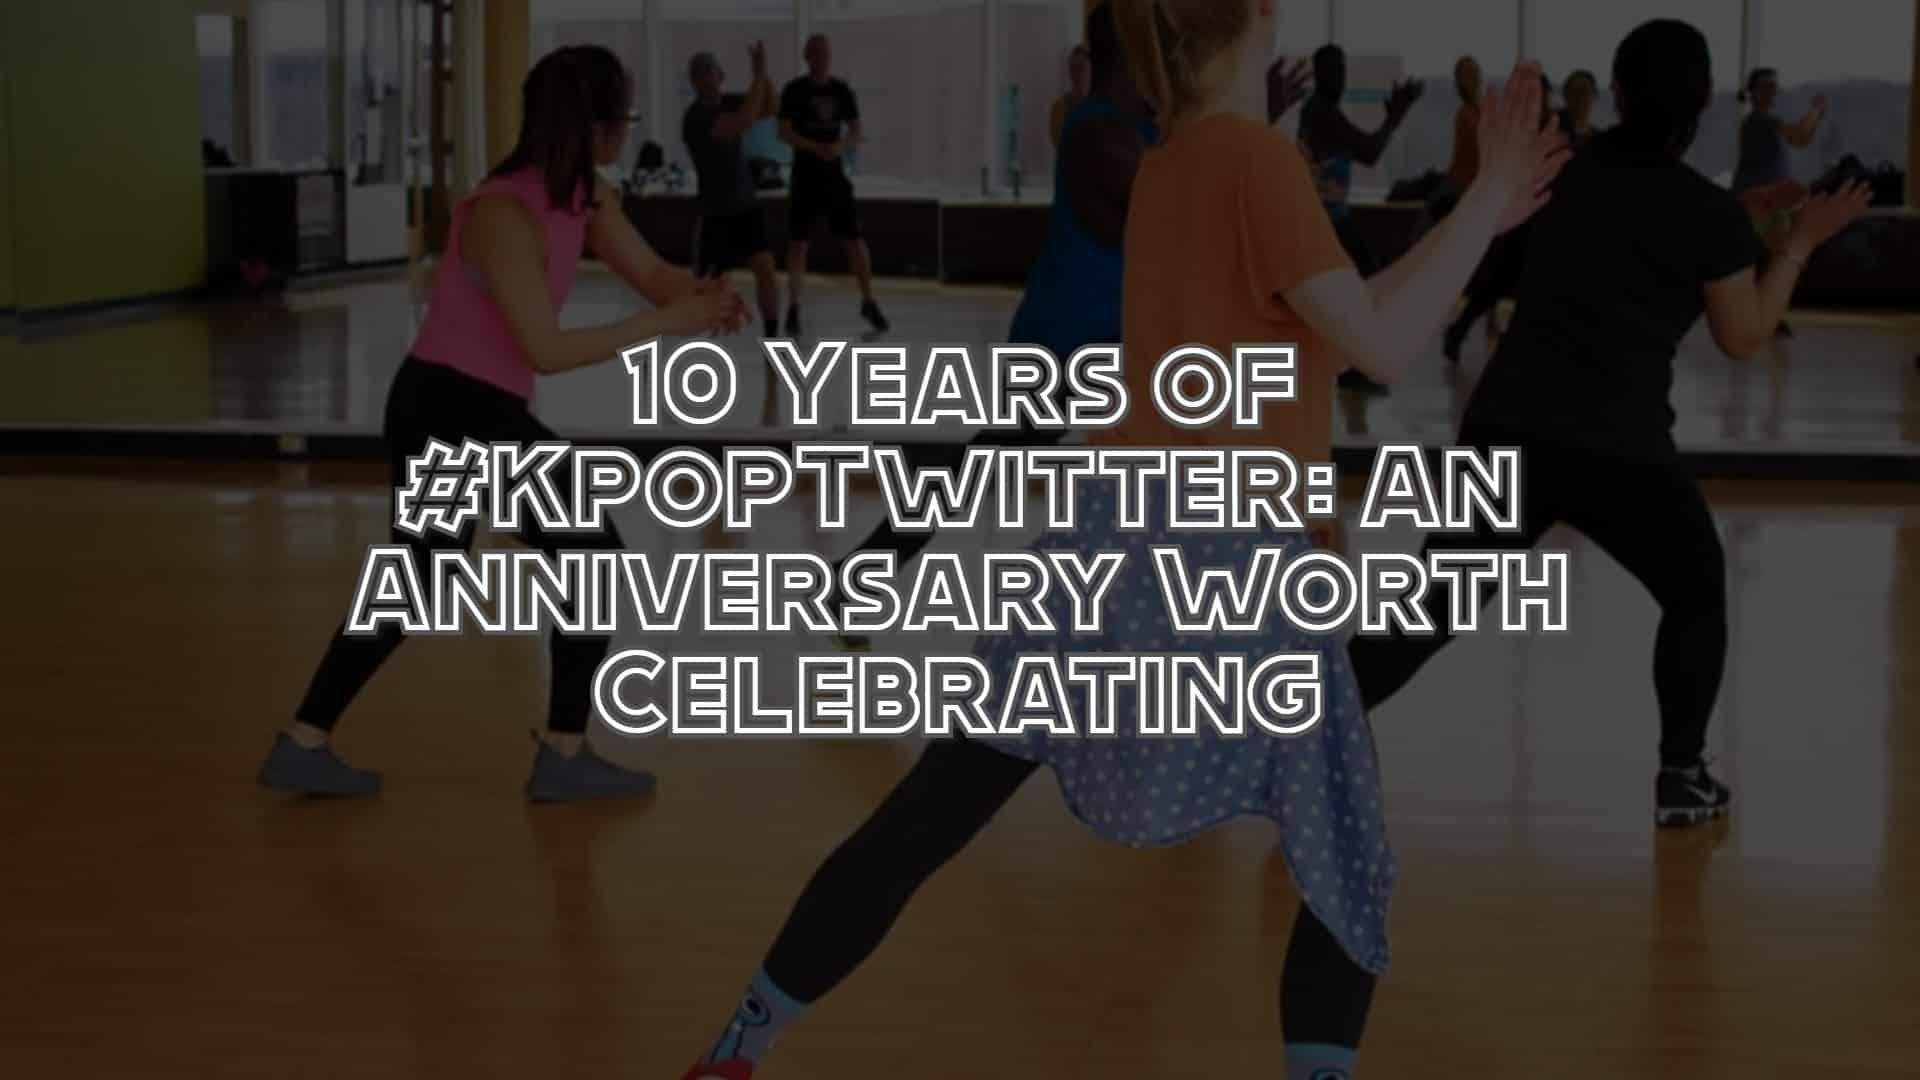 10 Years of #KpopTwitter: An Anniversary Worth Celebrating